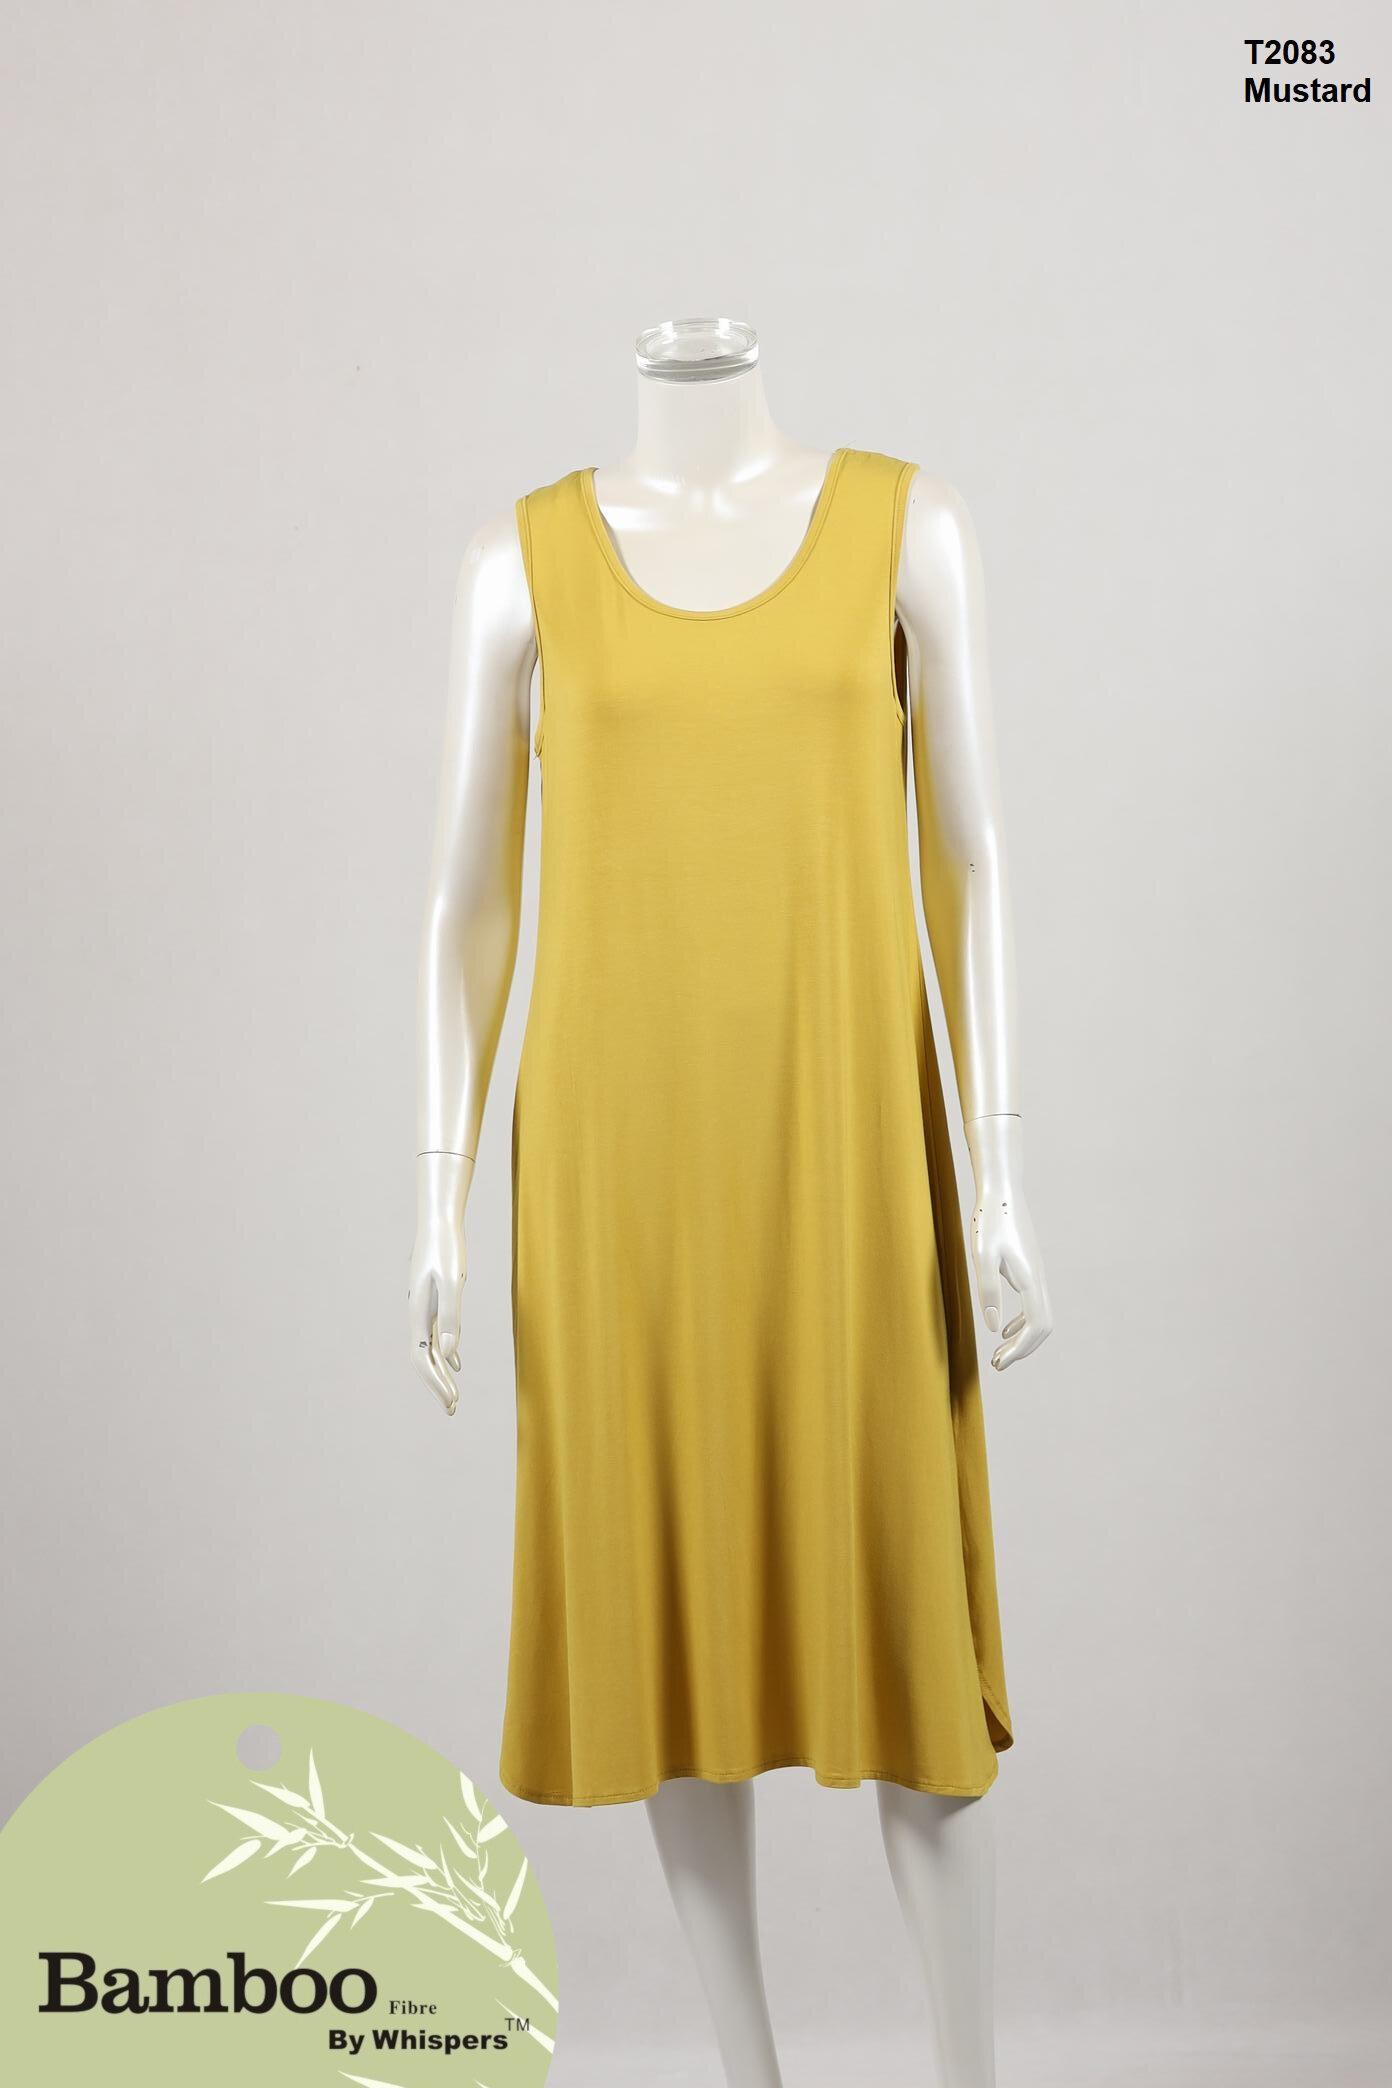 T2083-Bamboo Dress-Mustard.JPG